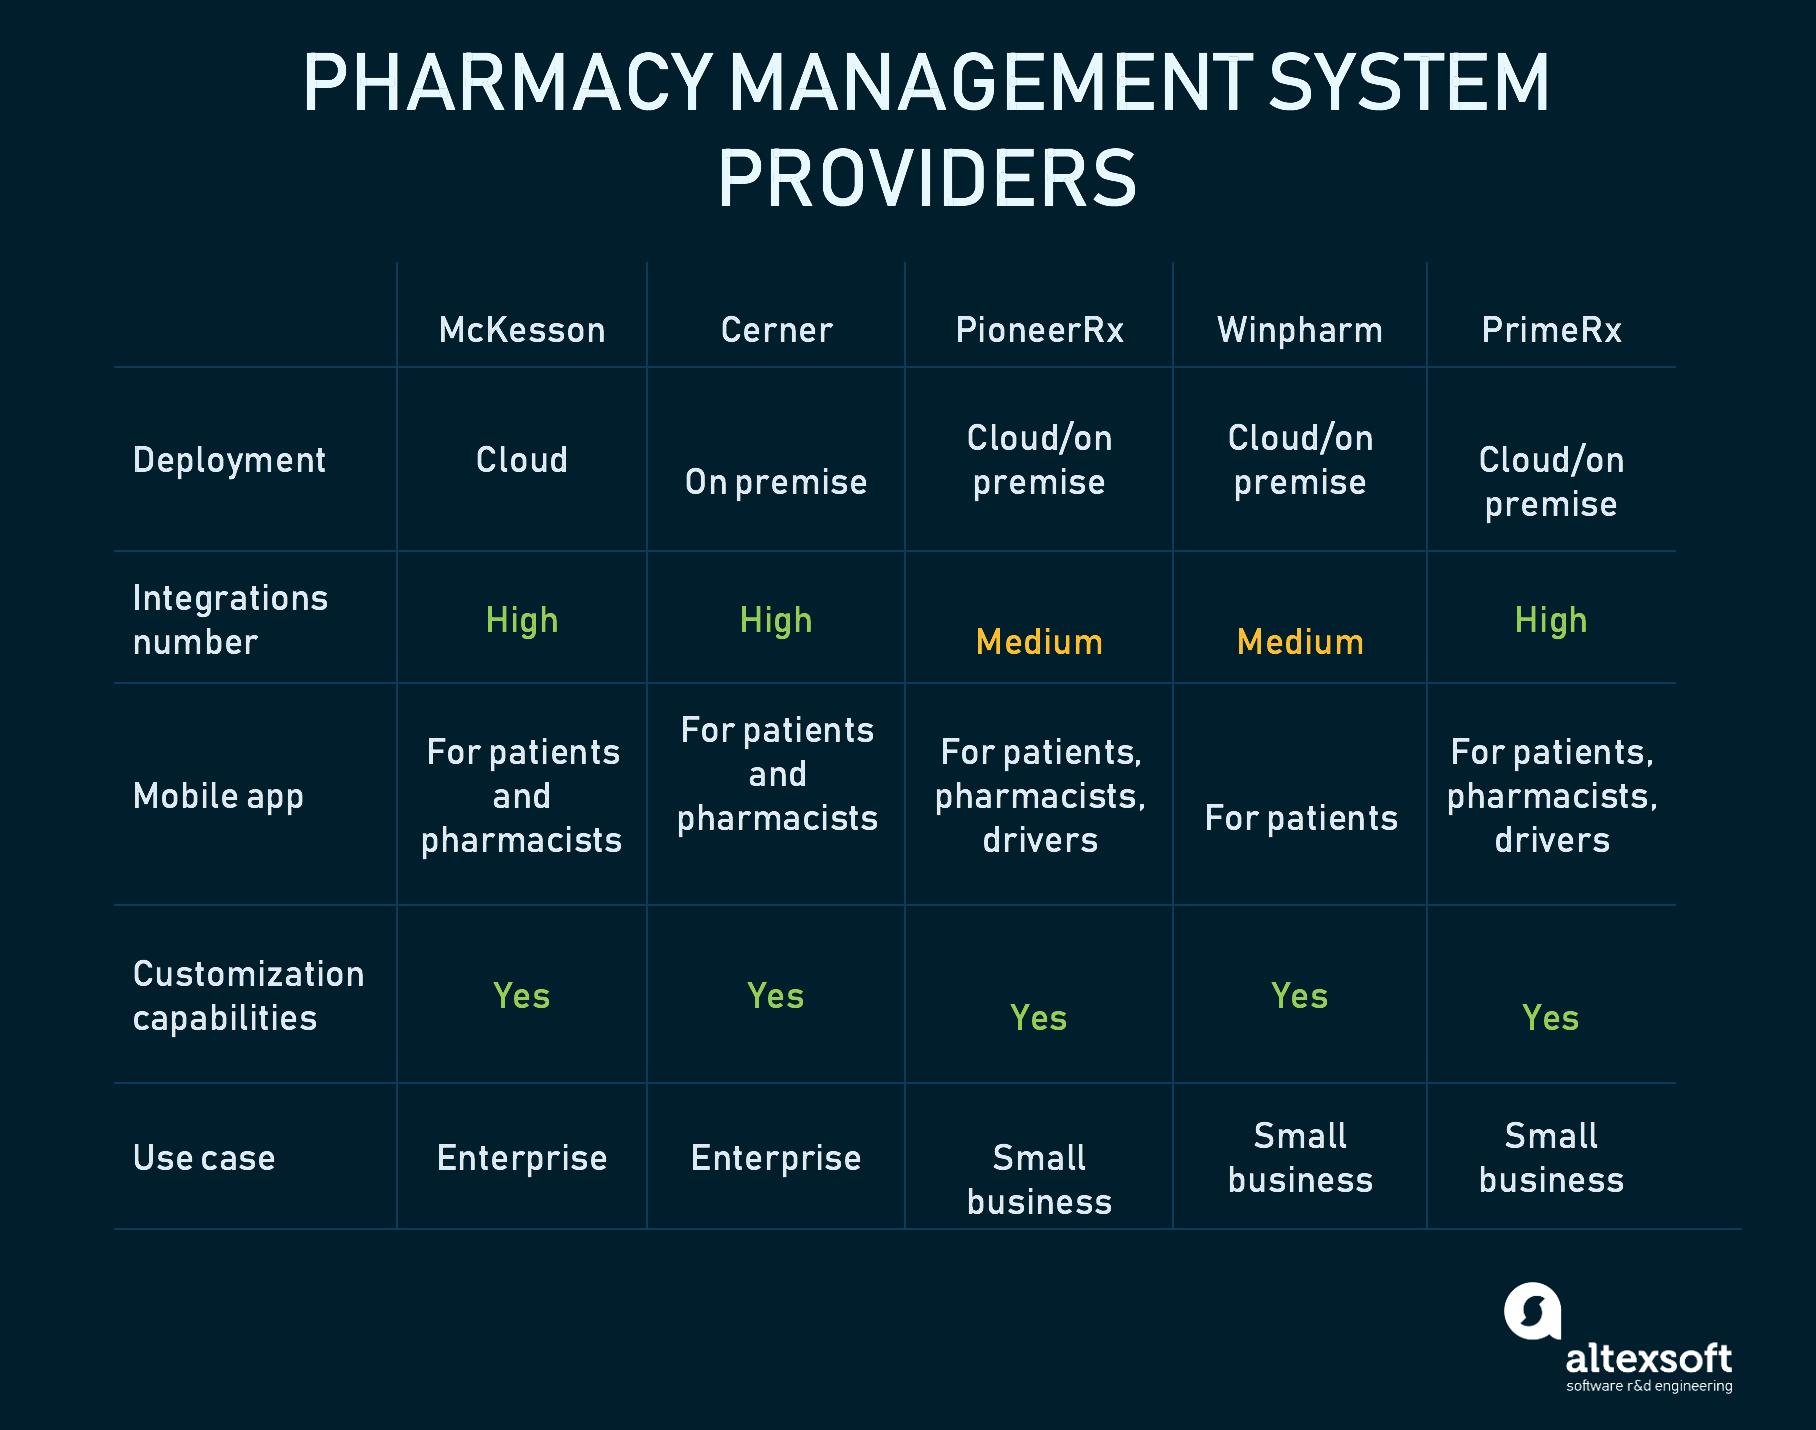 Pharmacy management systems comparison